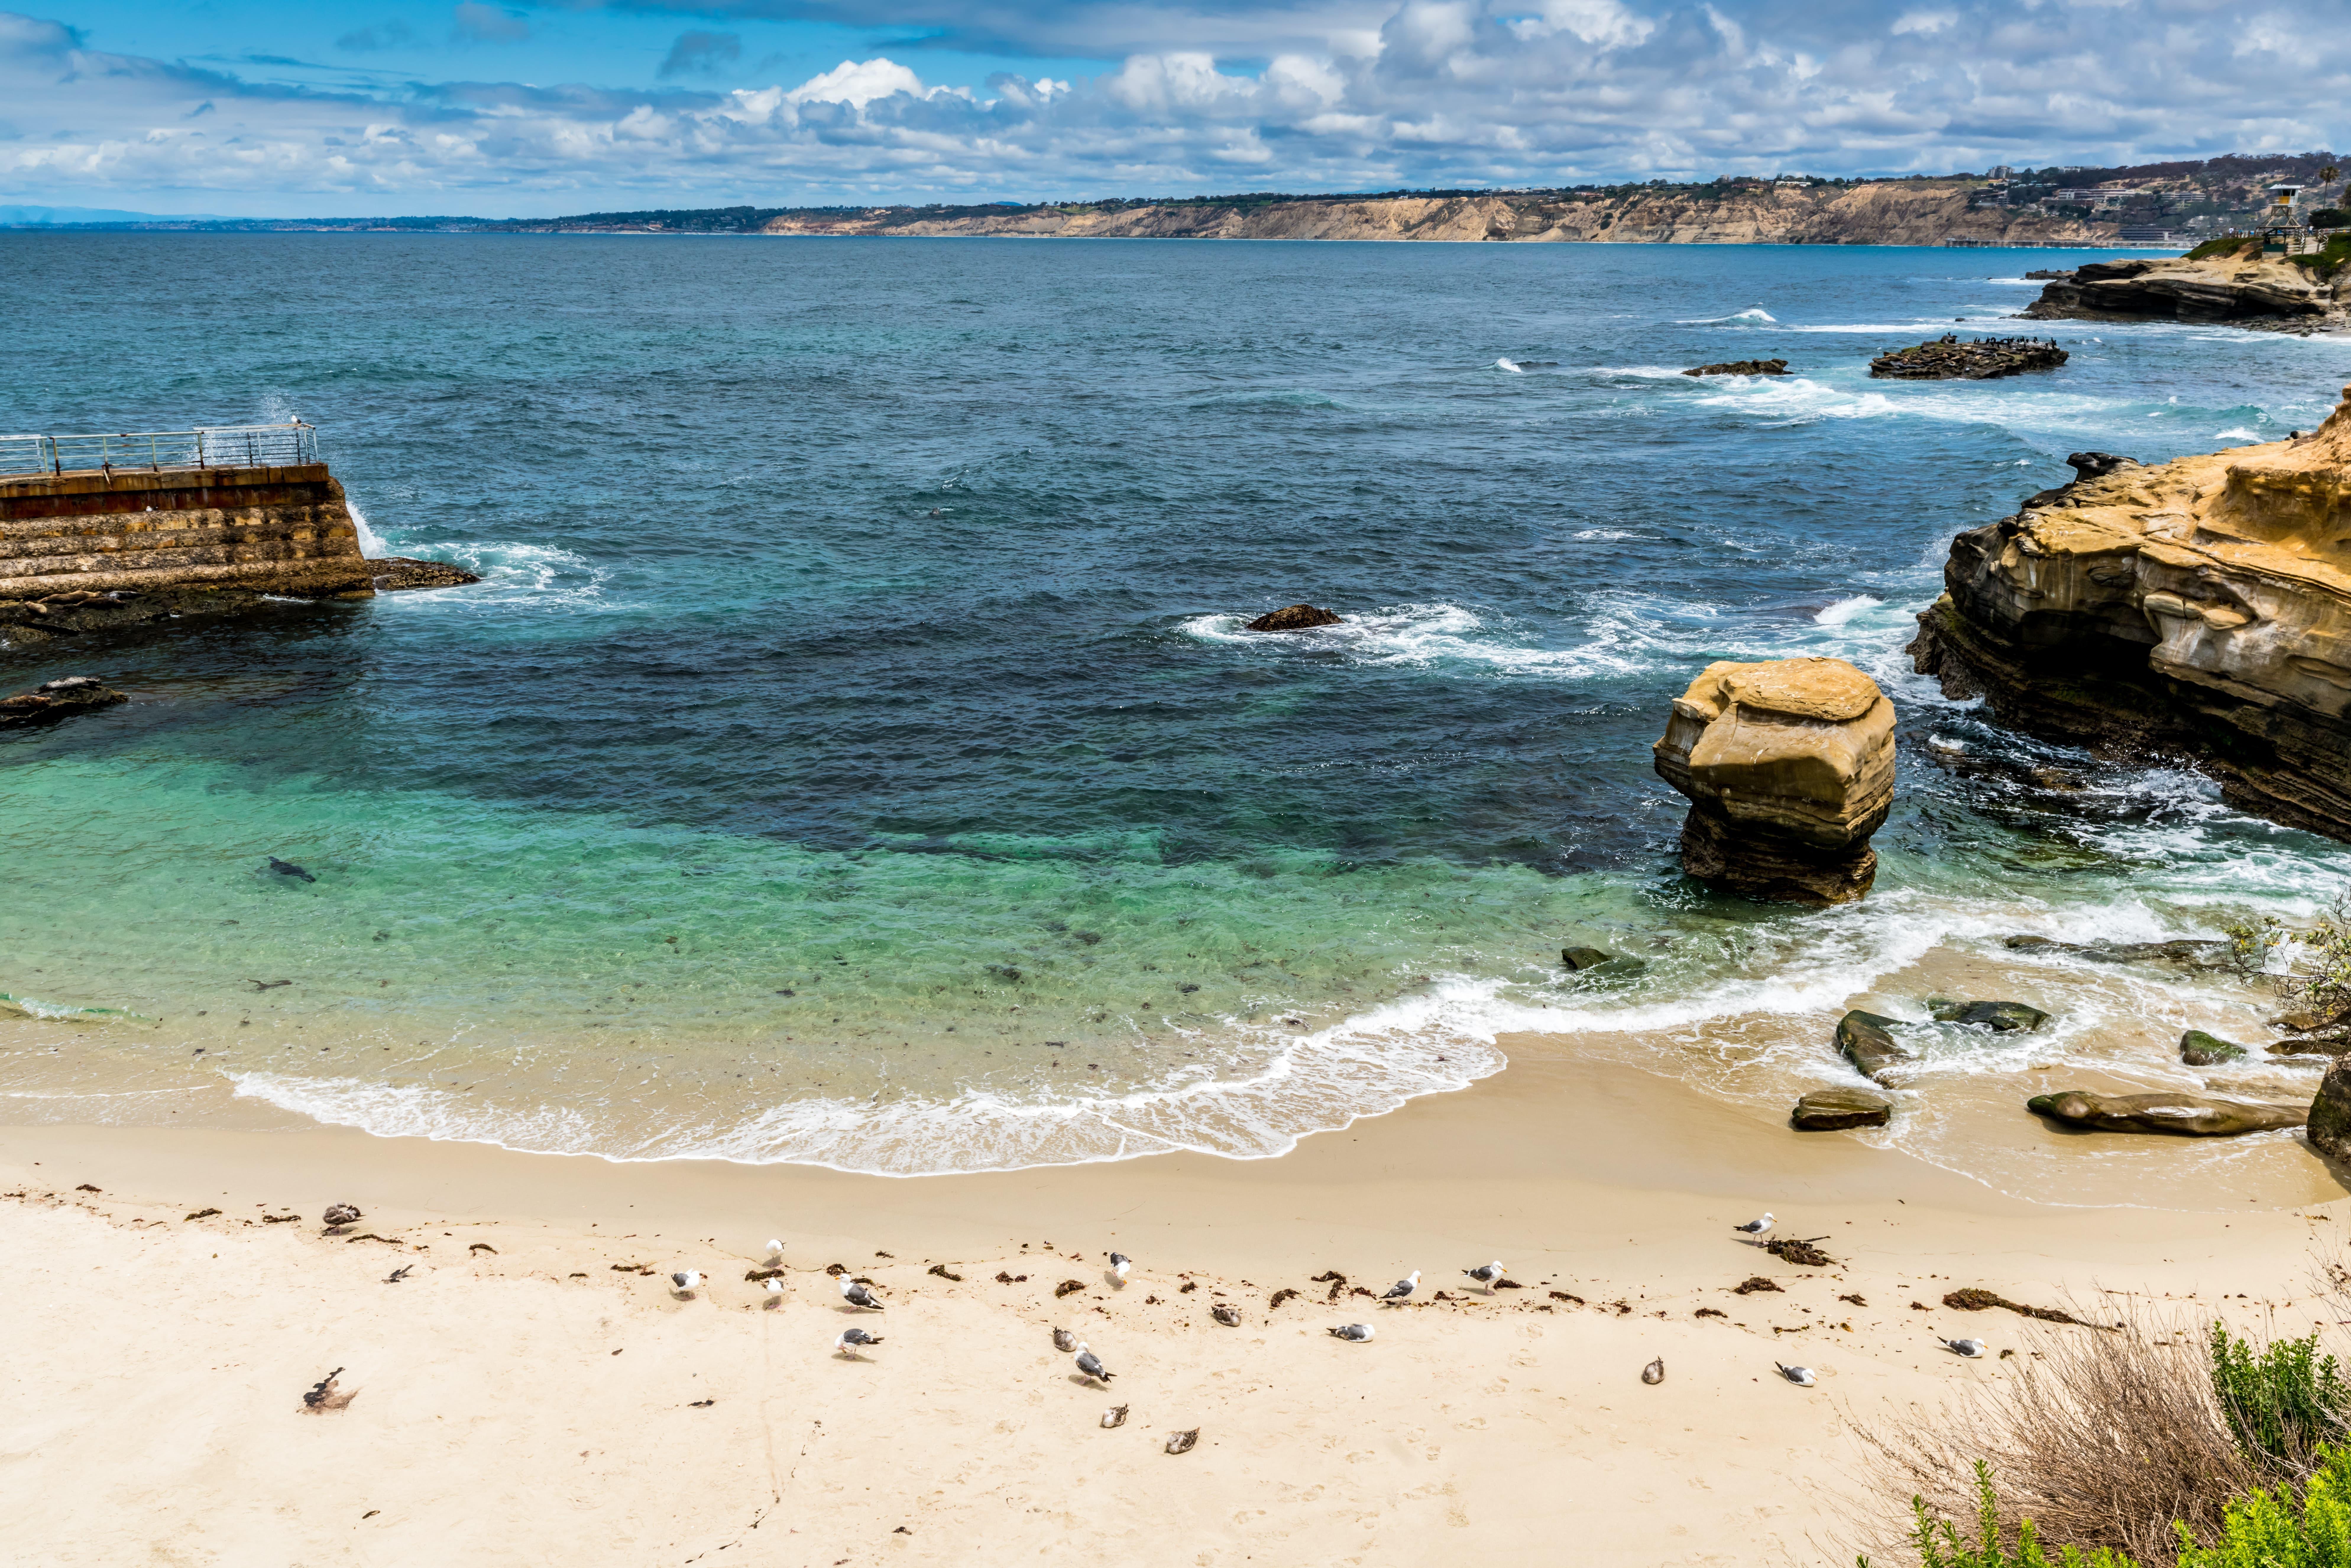 La Jolla Cove Paddleboard